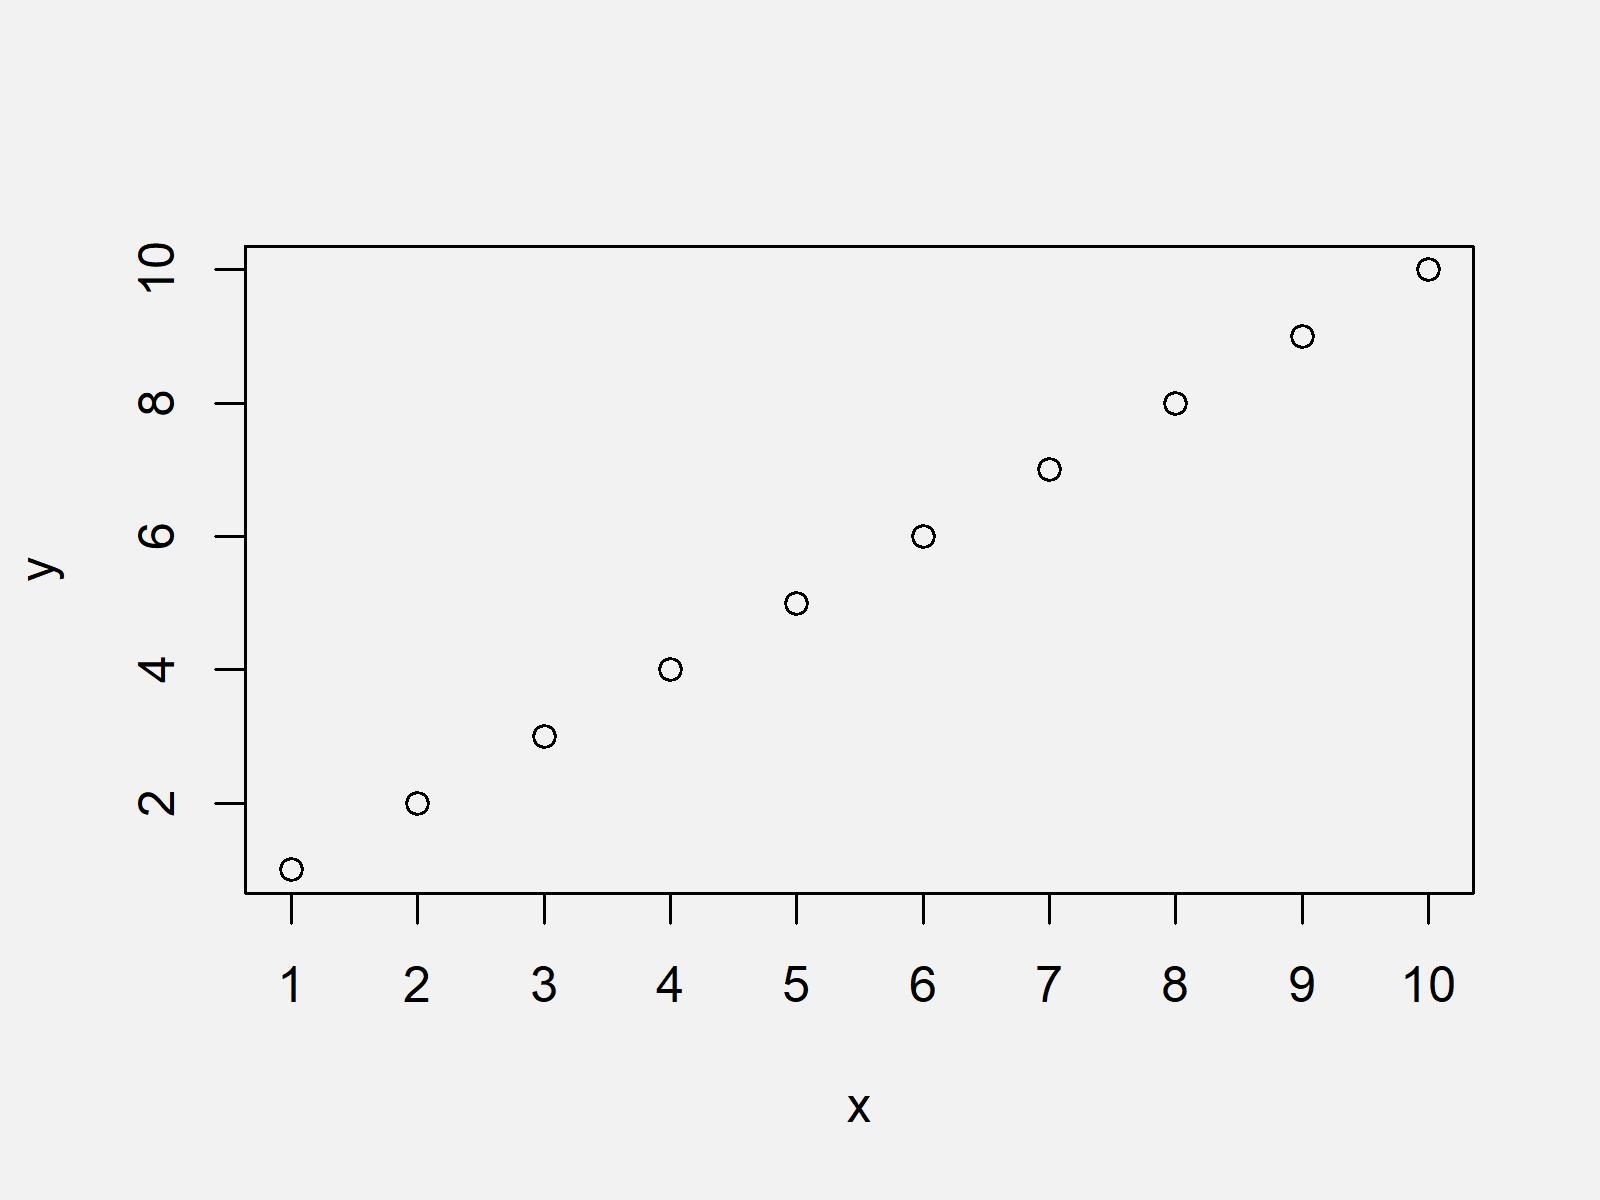 r graph figure 2 plot actual values as axis ticks r